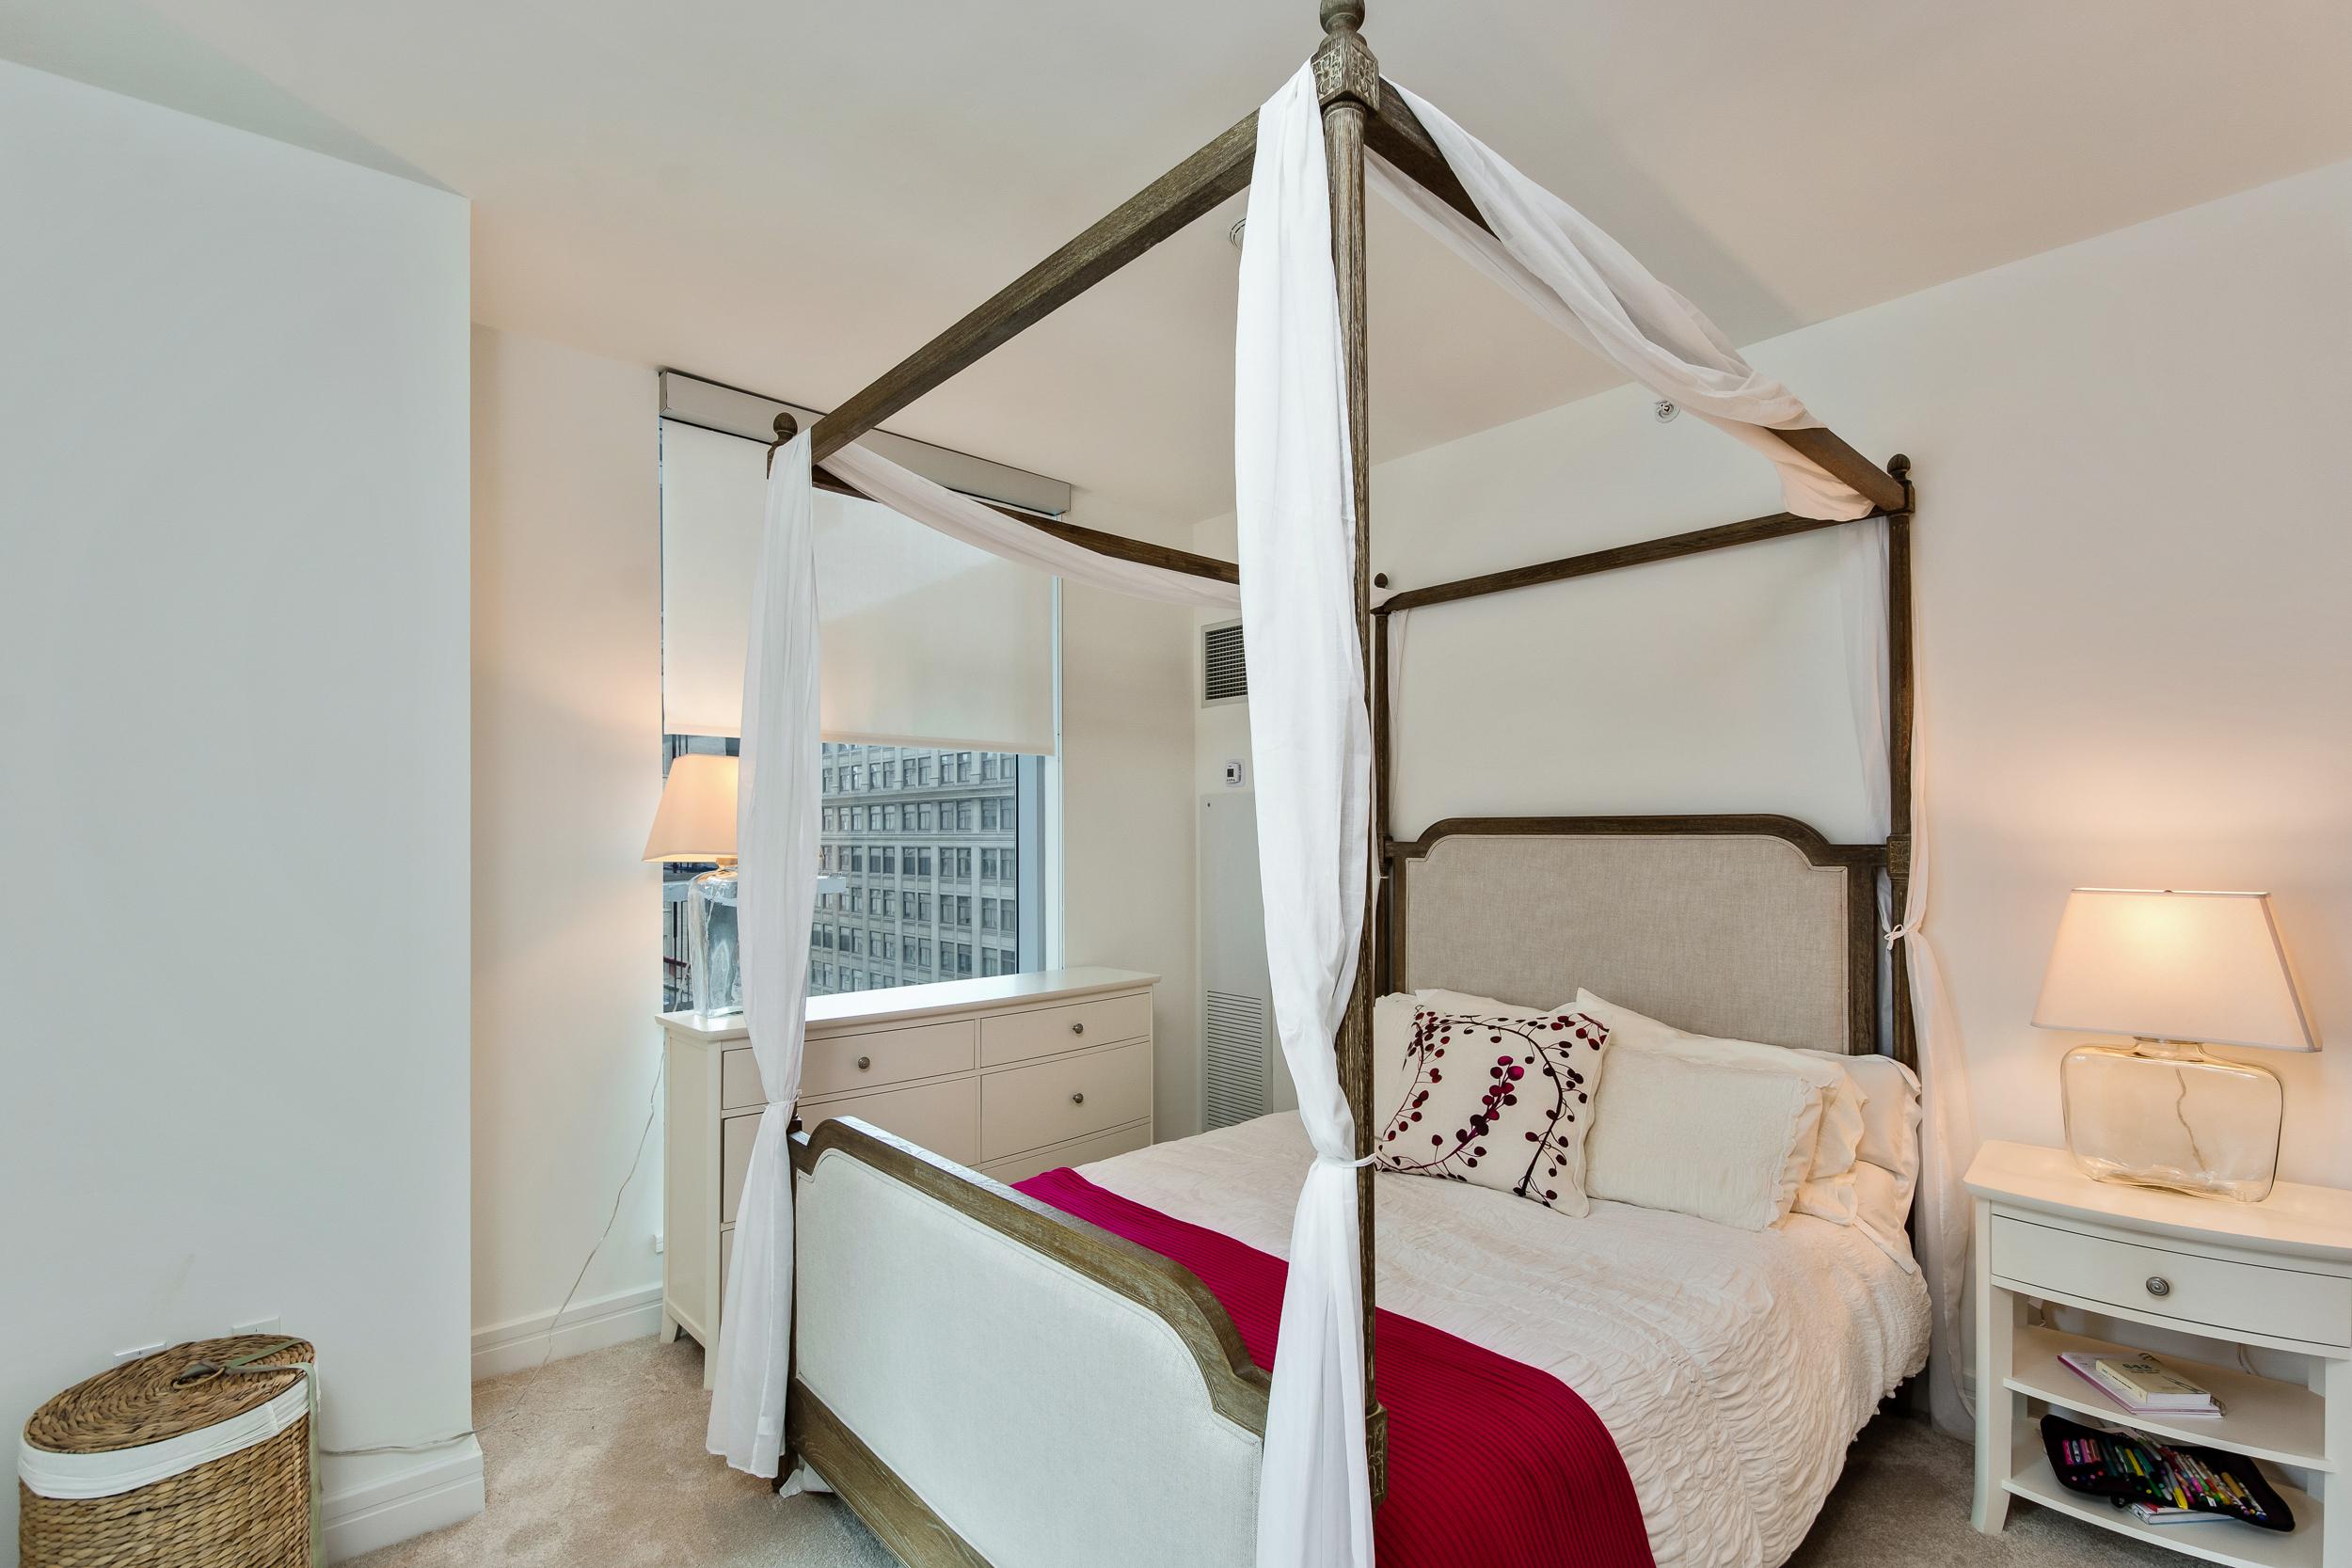 Philadelphia Luxury Home Condo-the ritz carlton residences 20H bryant wilde realty10.jpg